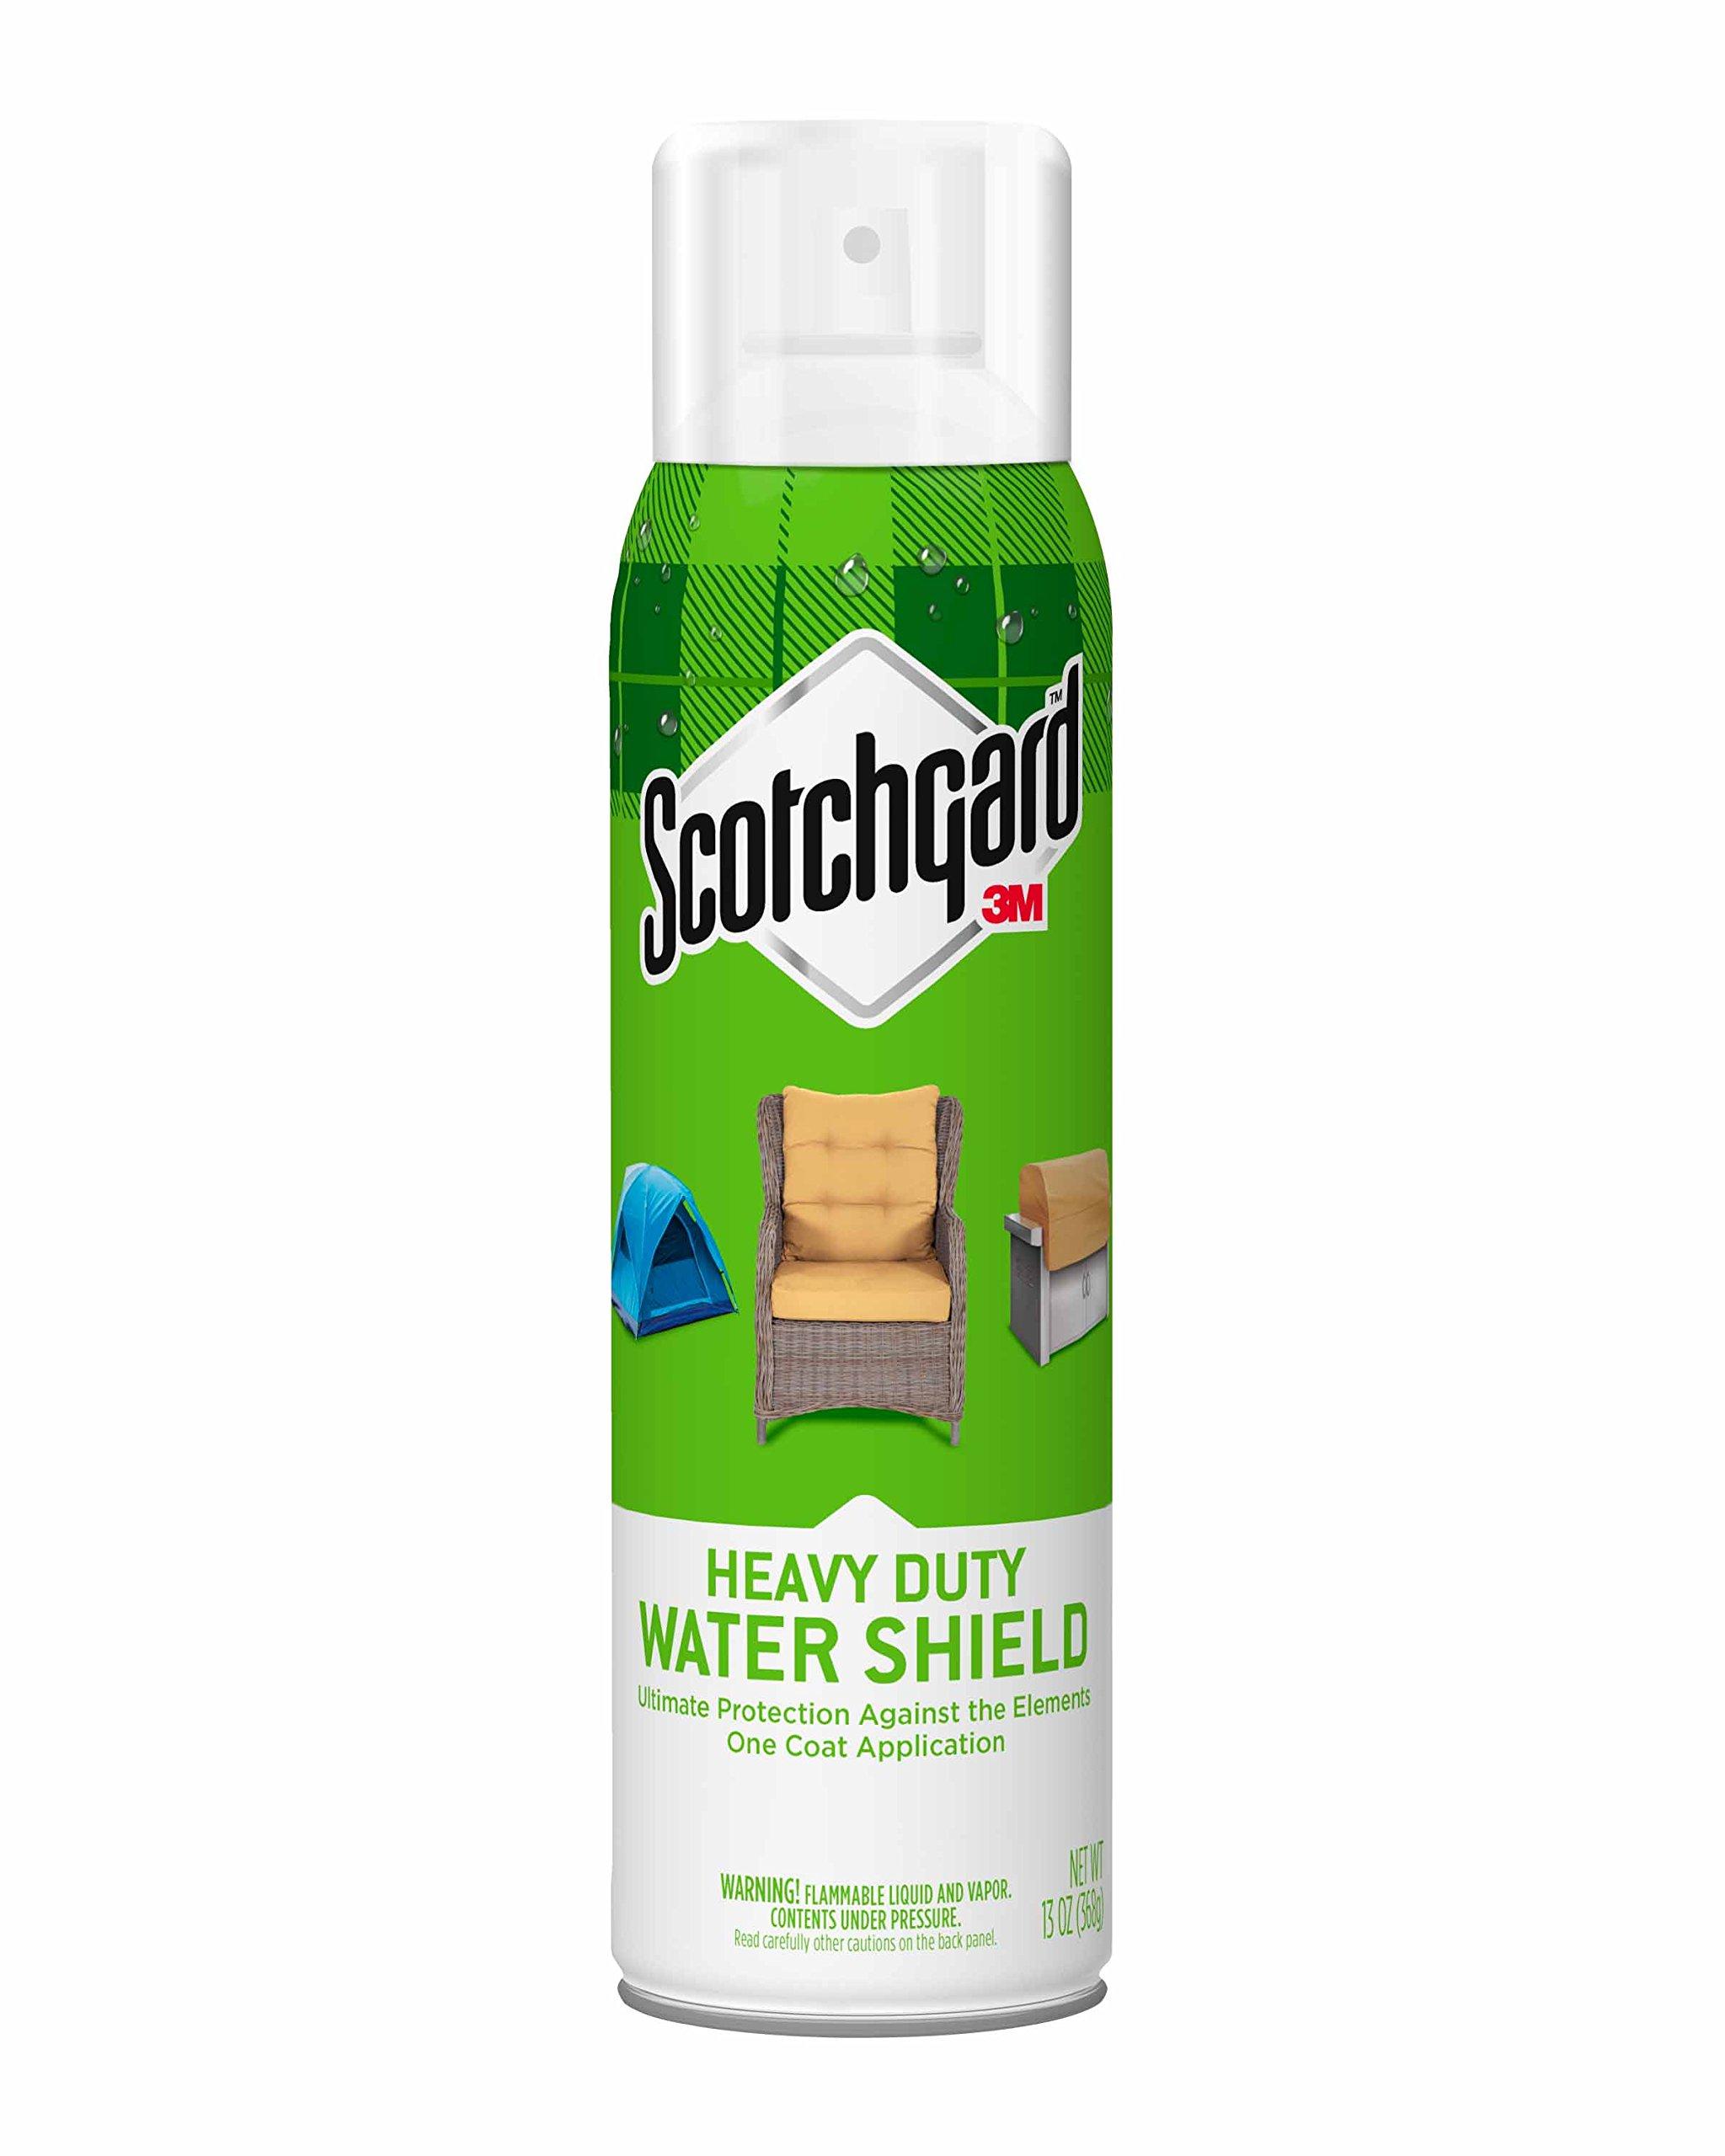 Scotchgard Heavy Duty Water Shield Protector, 1 Can, 13-Ounces